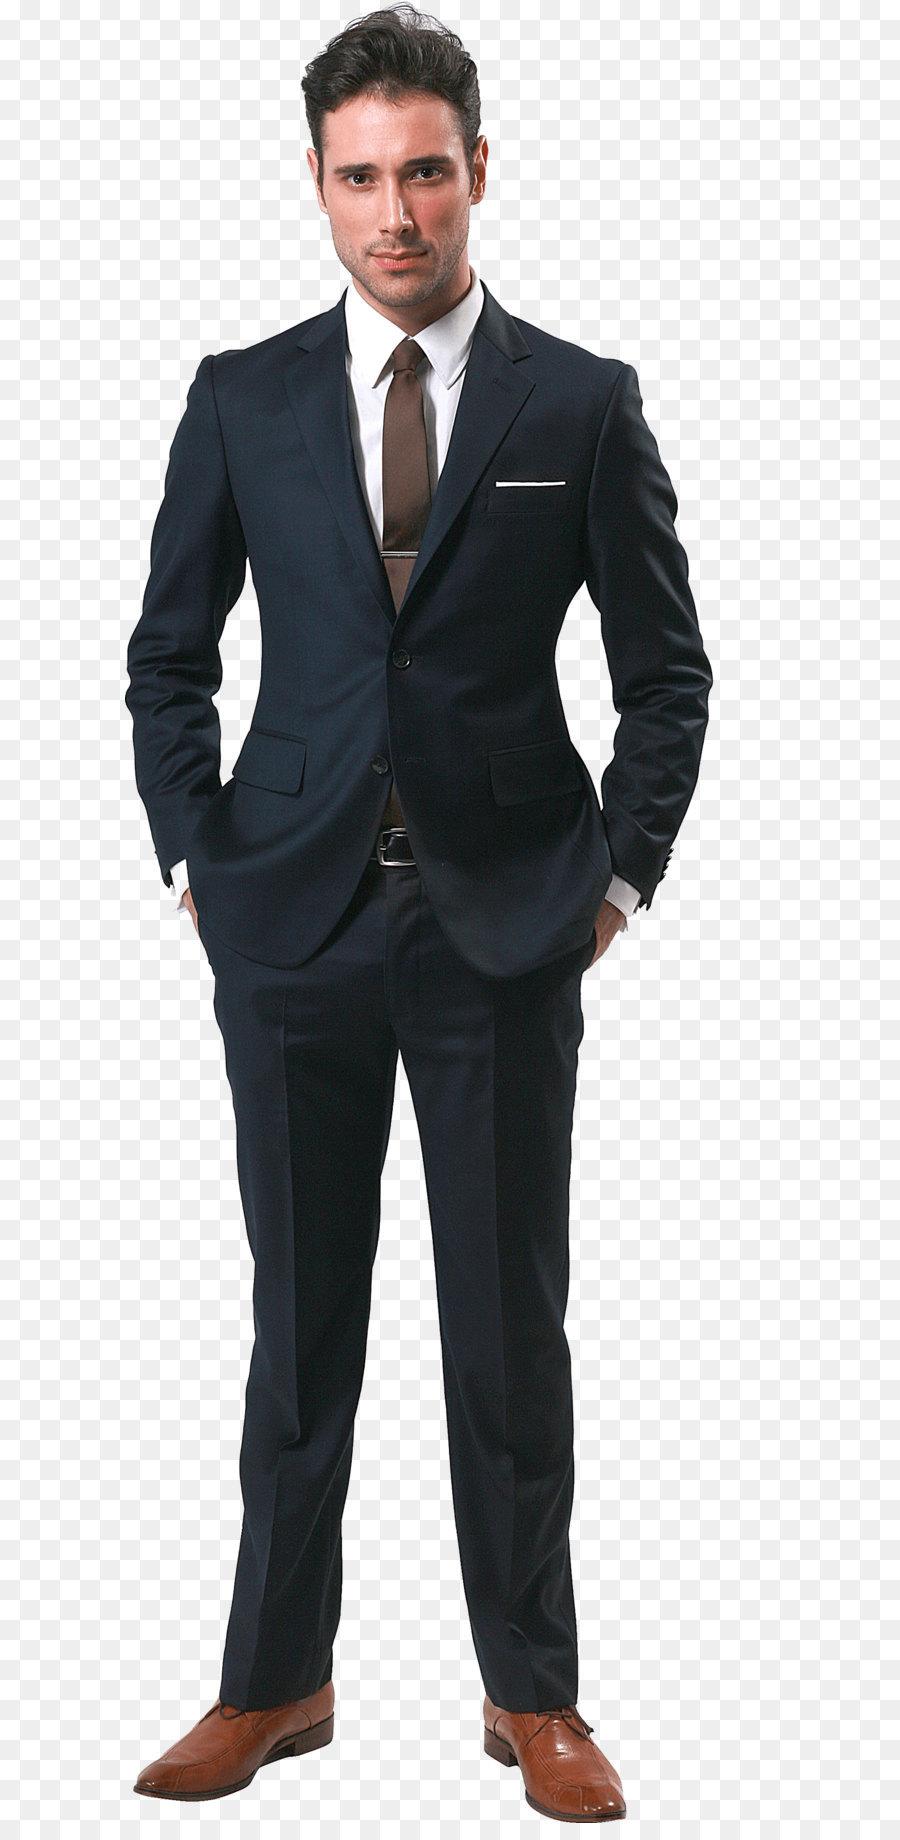 Businessman Png Image Png